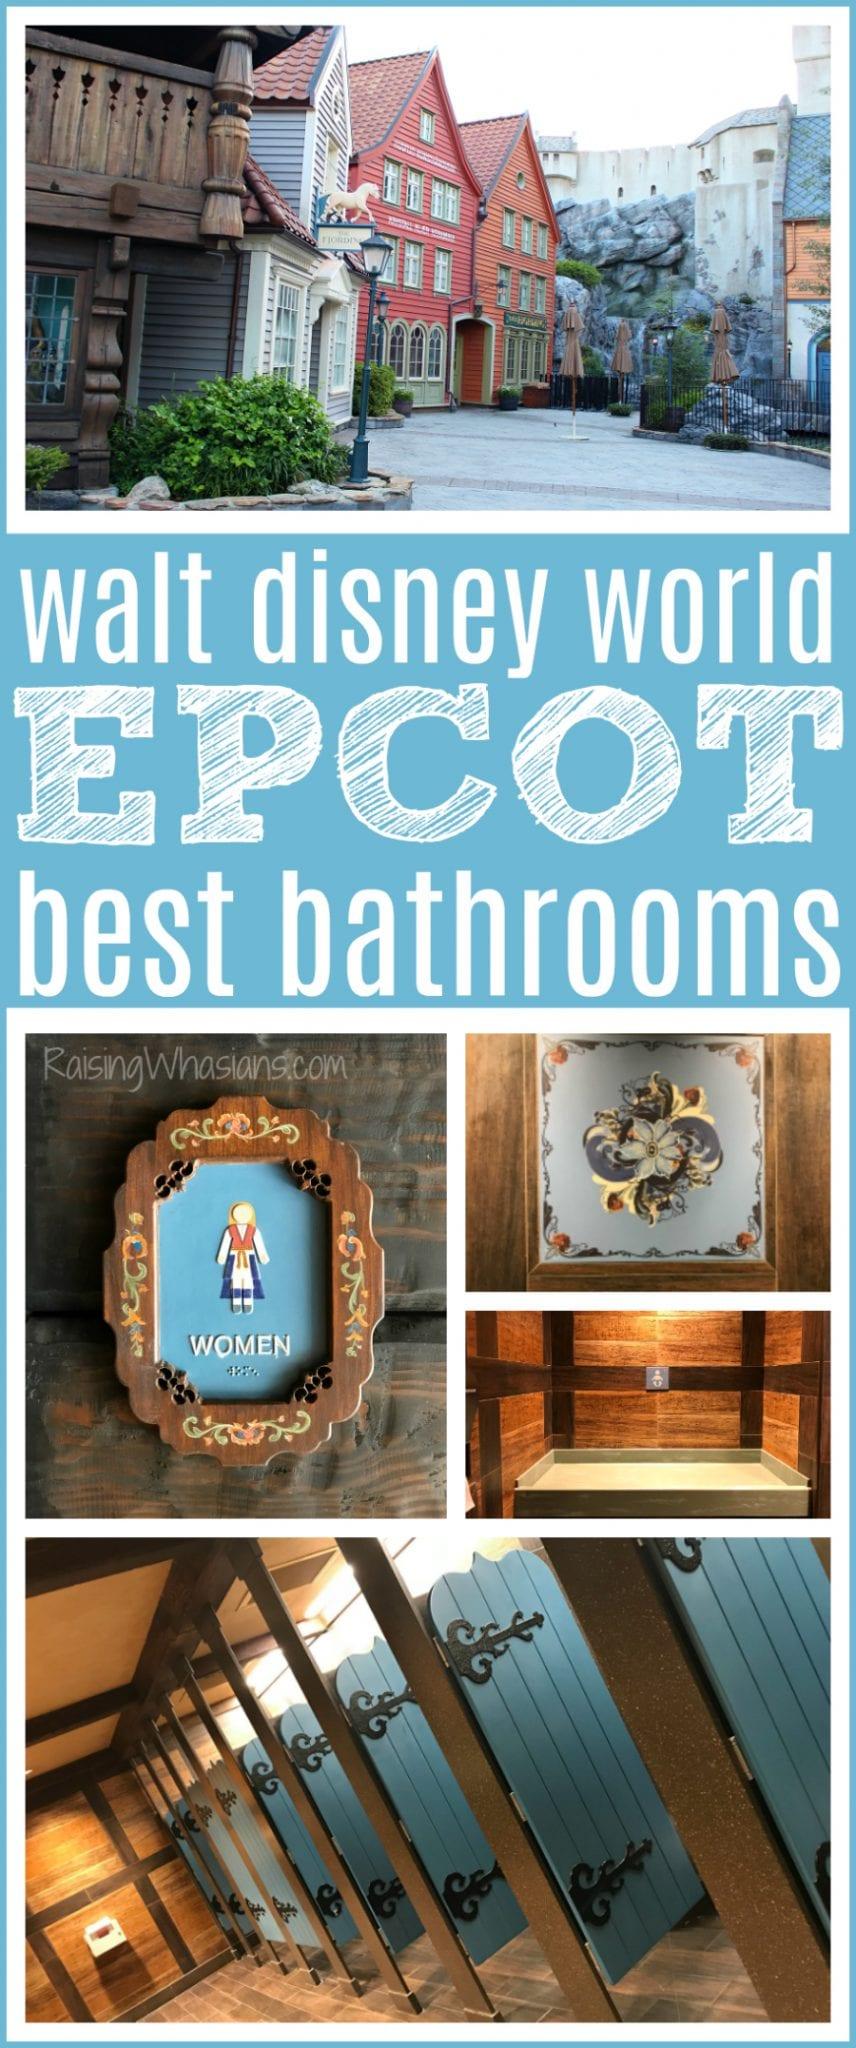 Walt Disney world best bathrooms